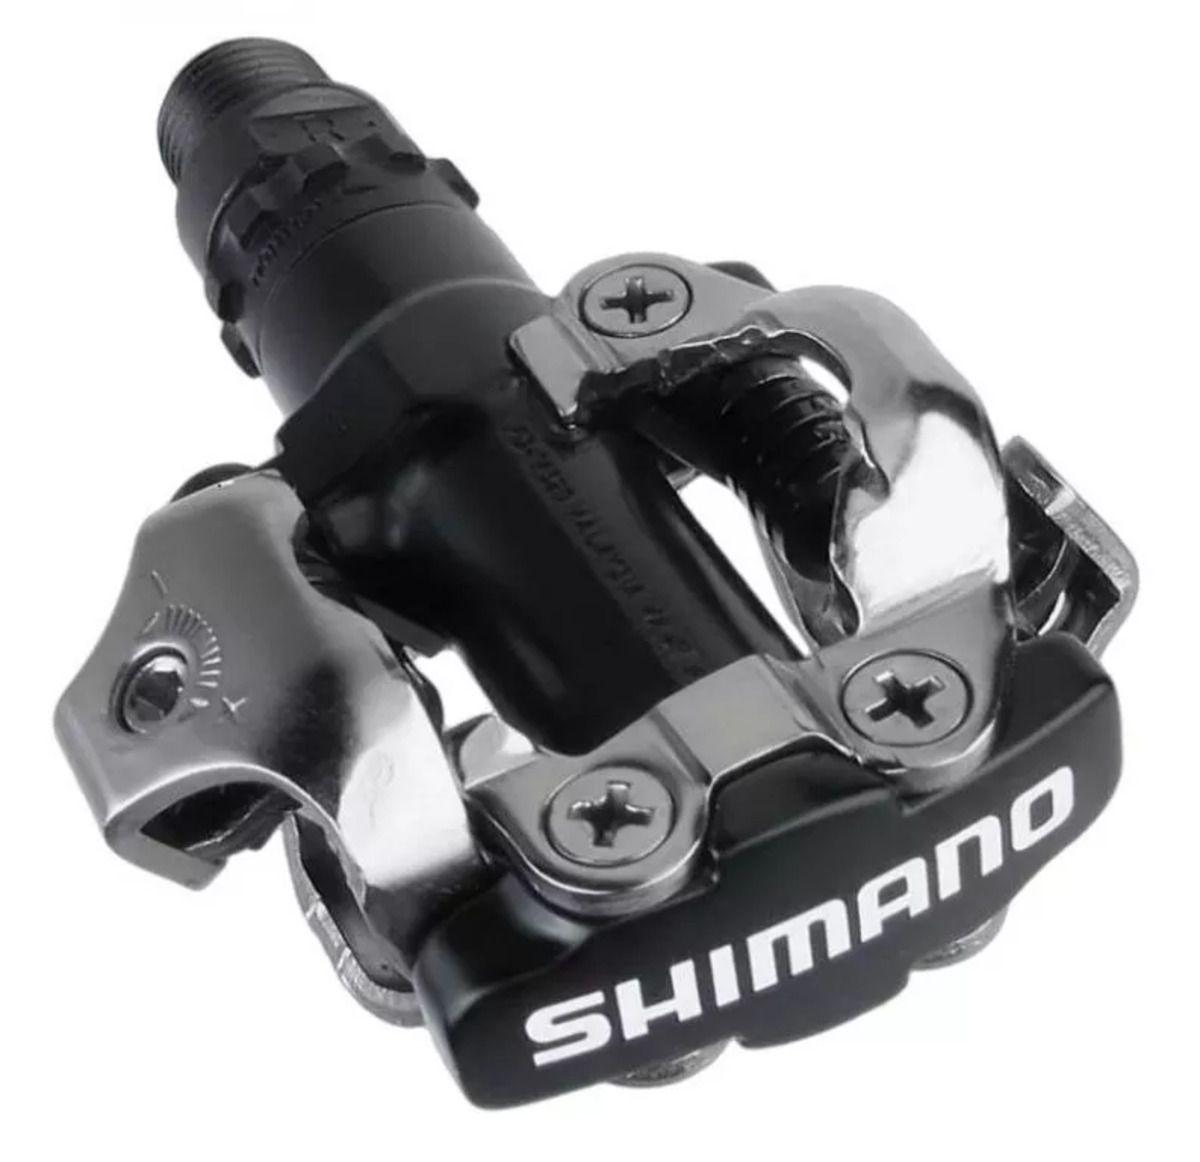 Kit Sapatilha Giro Berm + Pedal Clip Shimano PD-M520